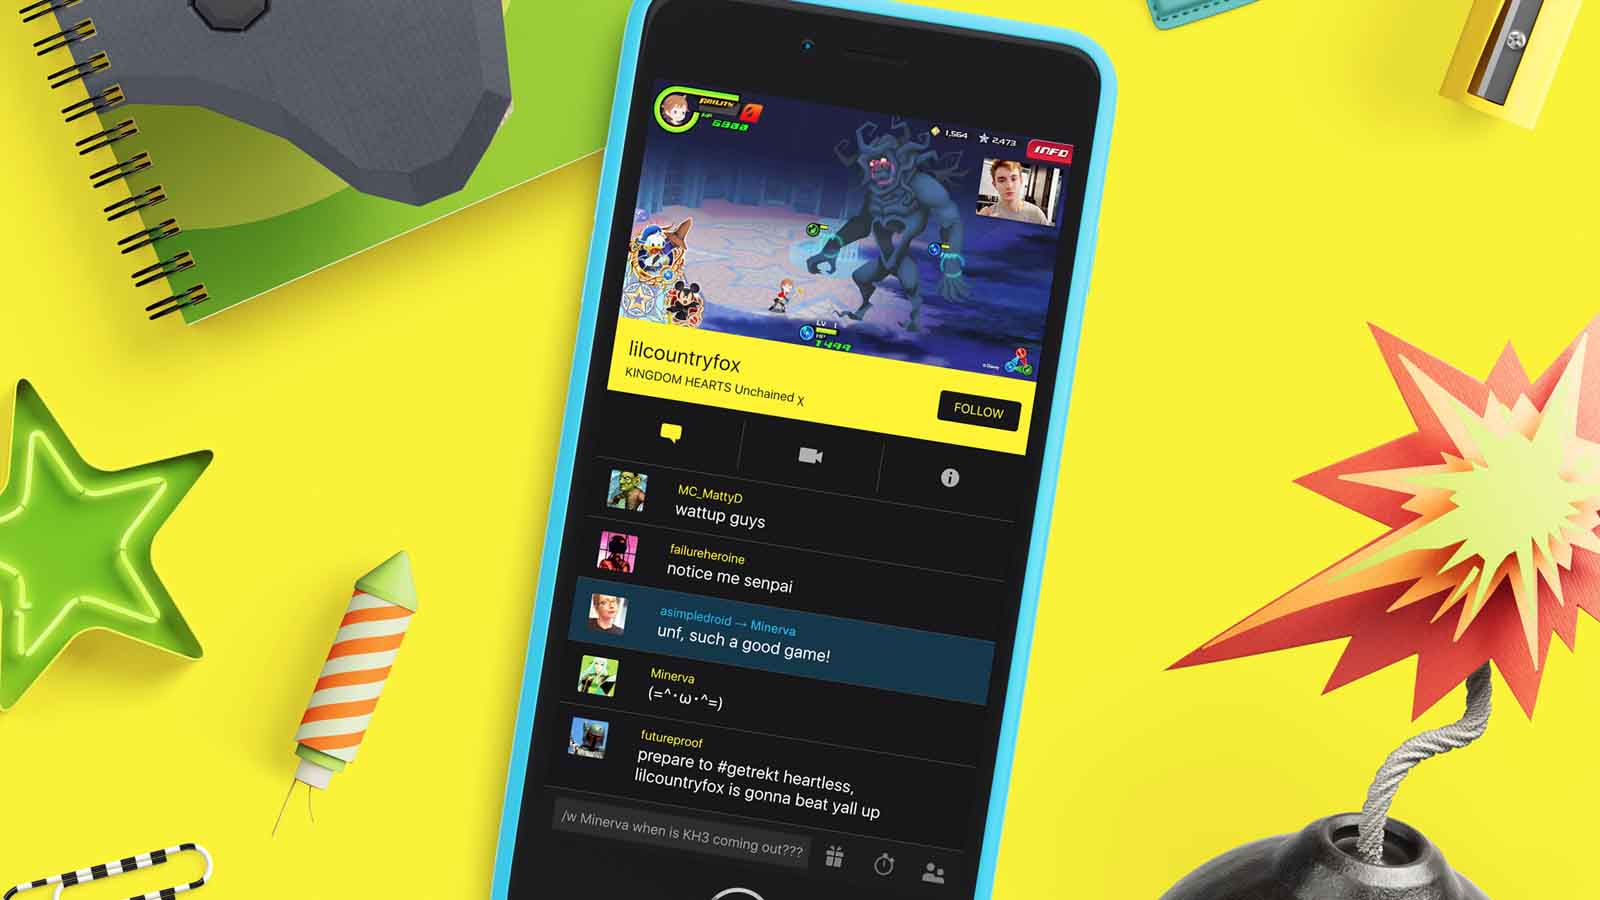 mobcrush streaming app